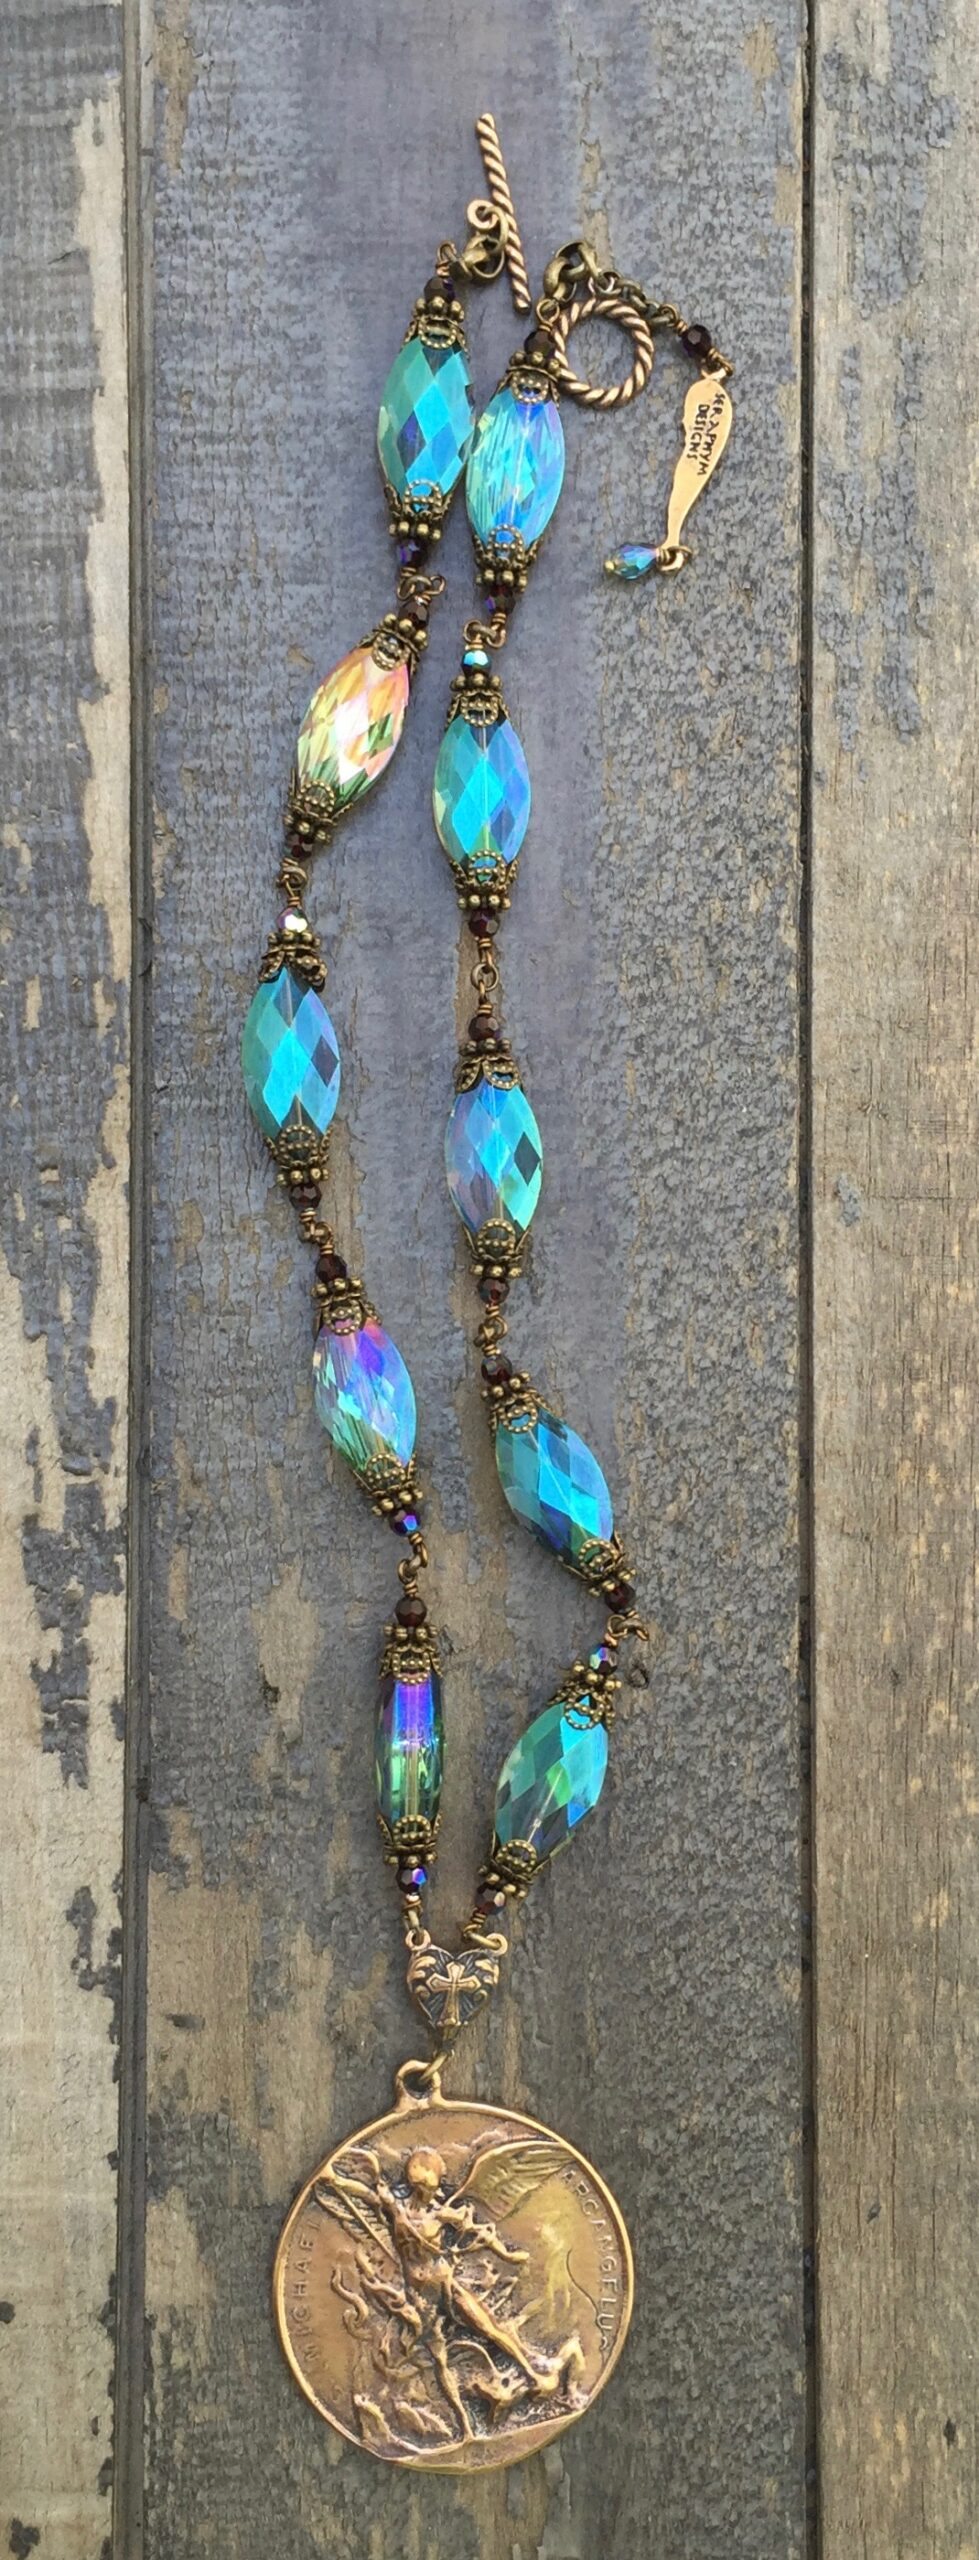 Aqua with Garnet Crystal Necklace – St Michael - 14x20mm